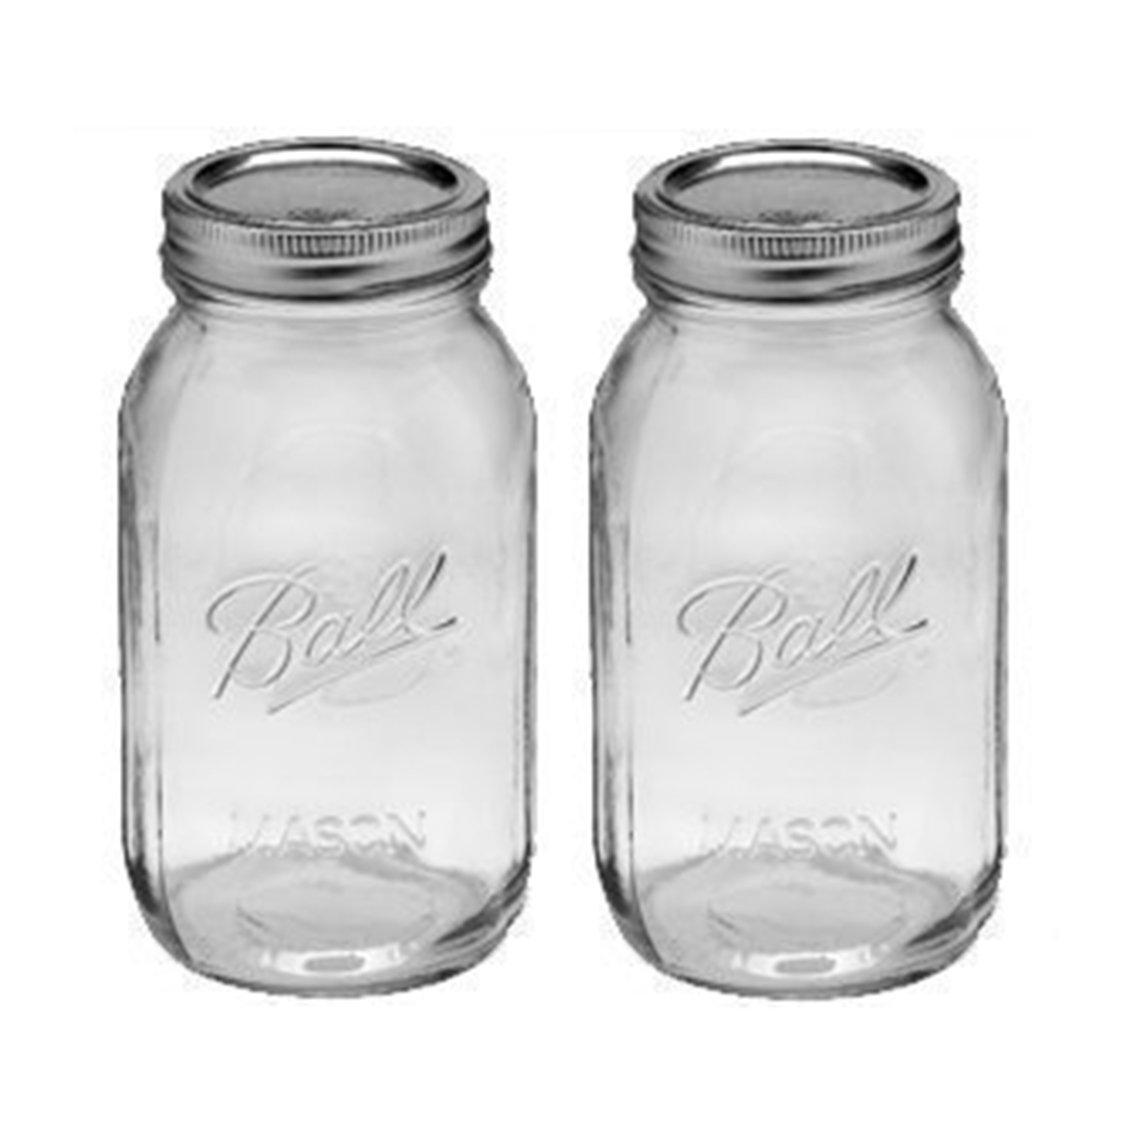 Amazon.com: 1 - 32oz Regular Mouth Ball Canning Mason Jar (Pack Of 2 ...